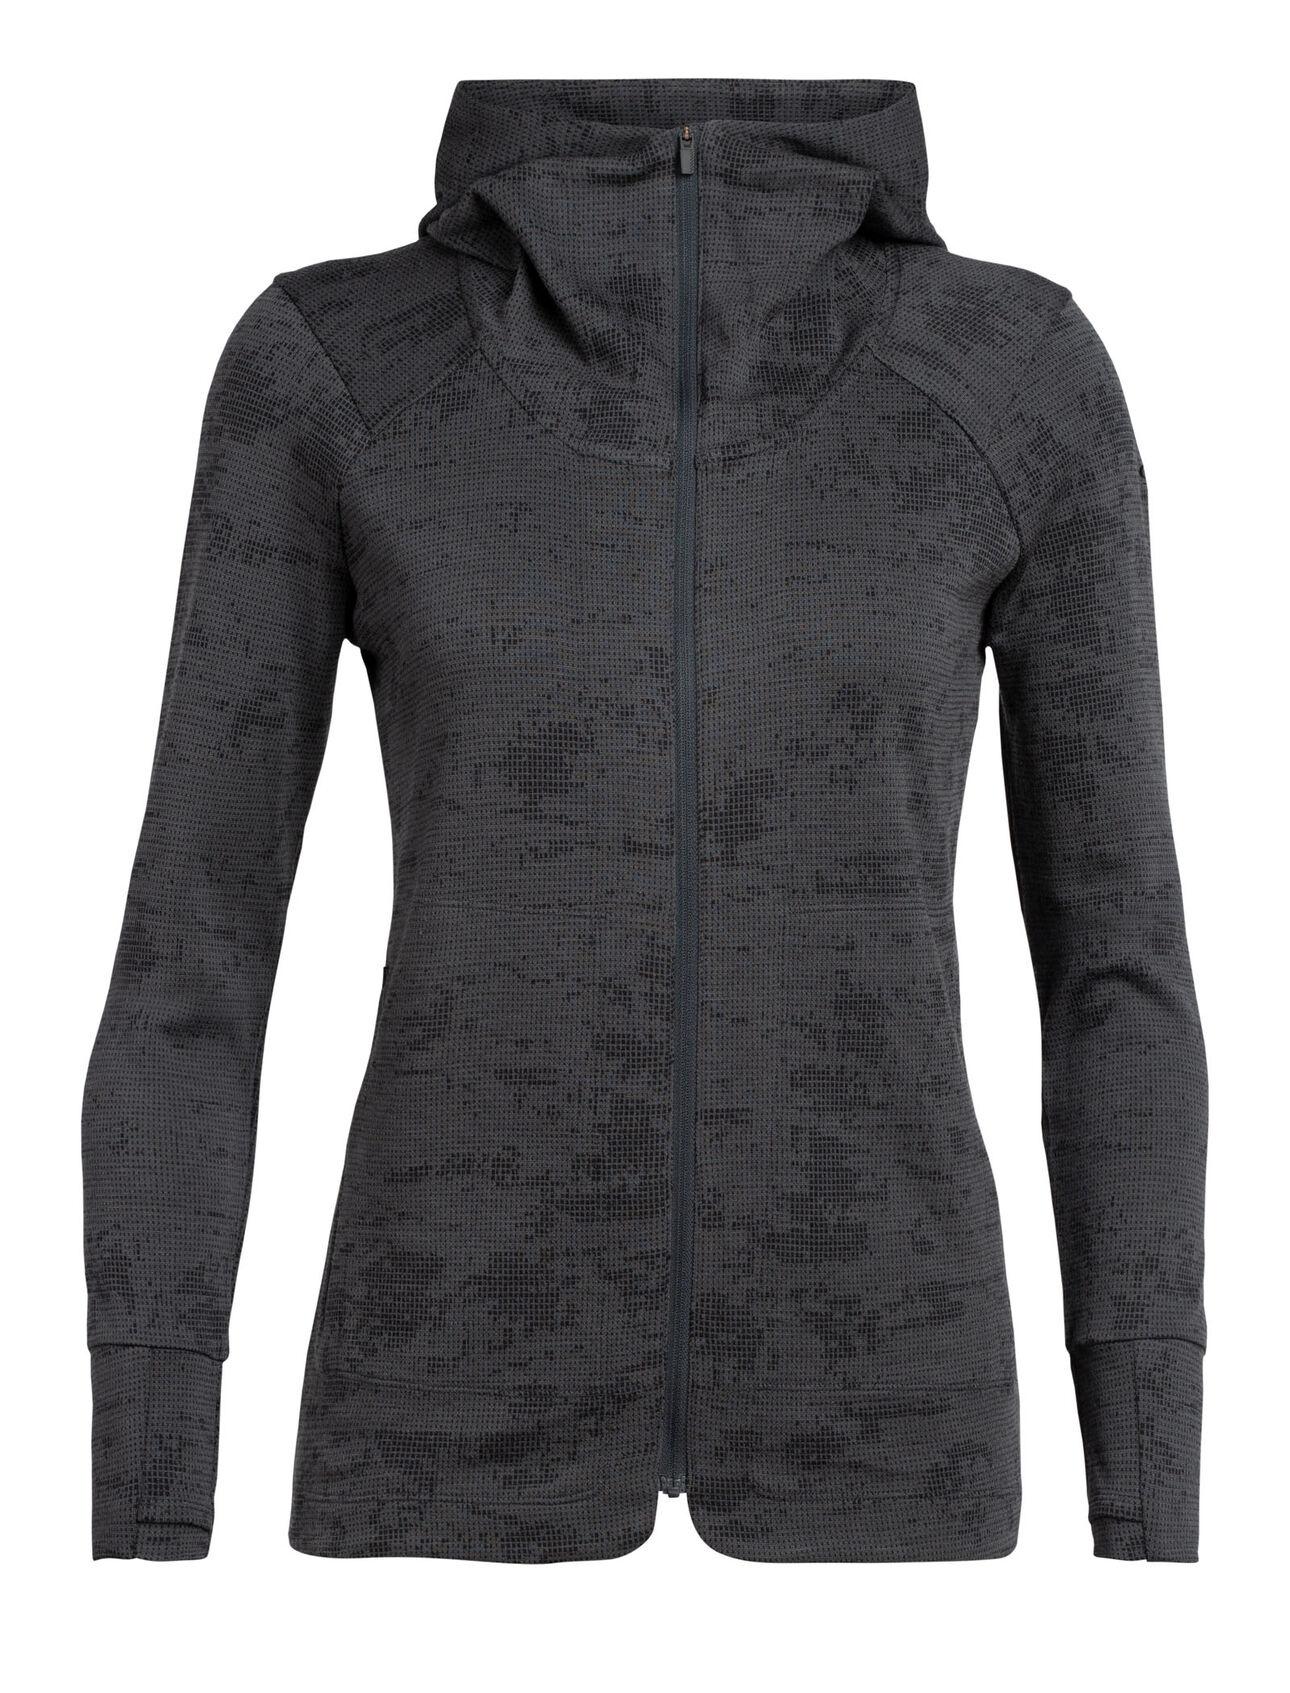 Icebreaker Women's Away II Long Sleeve Zip Hood